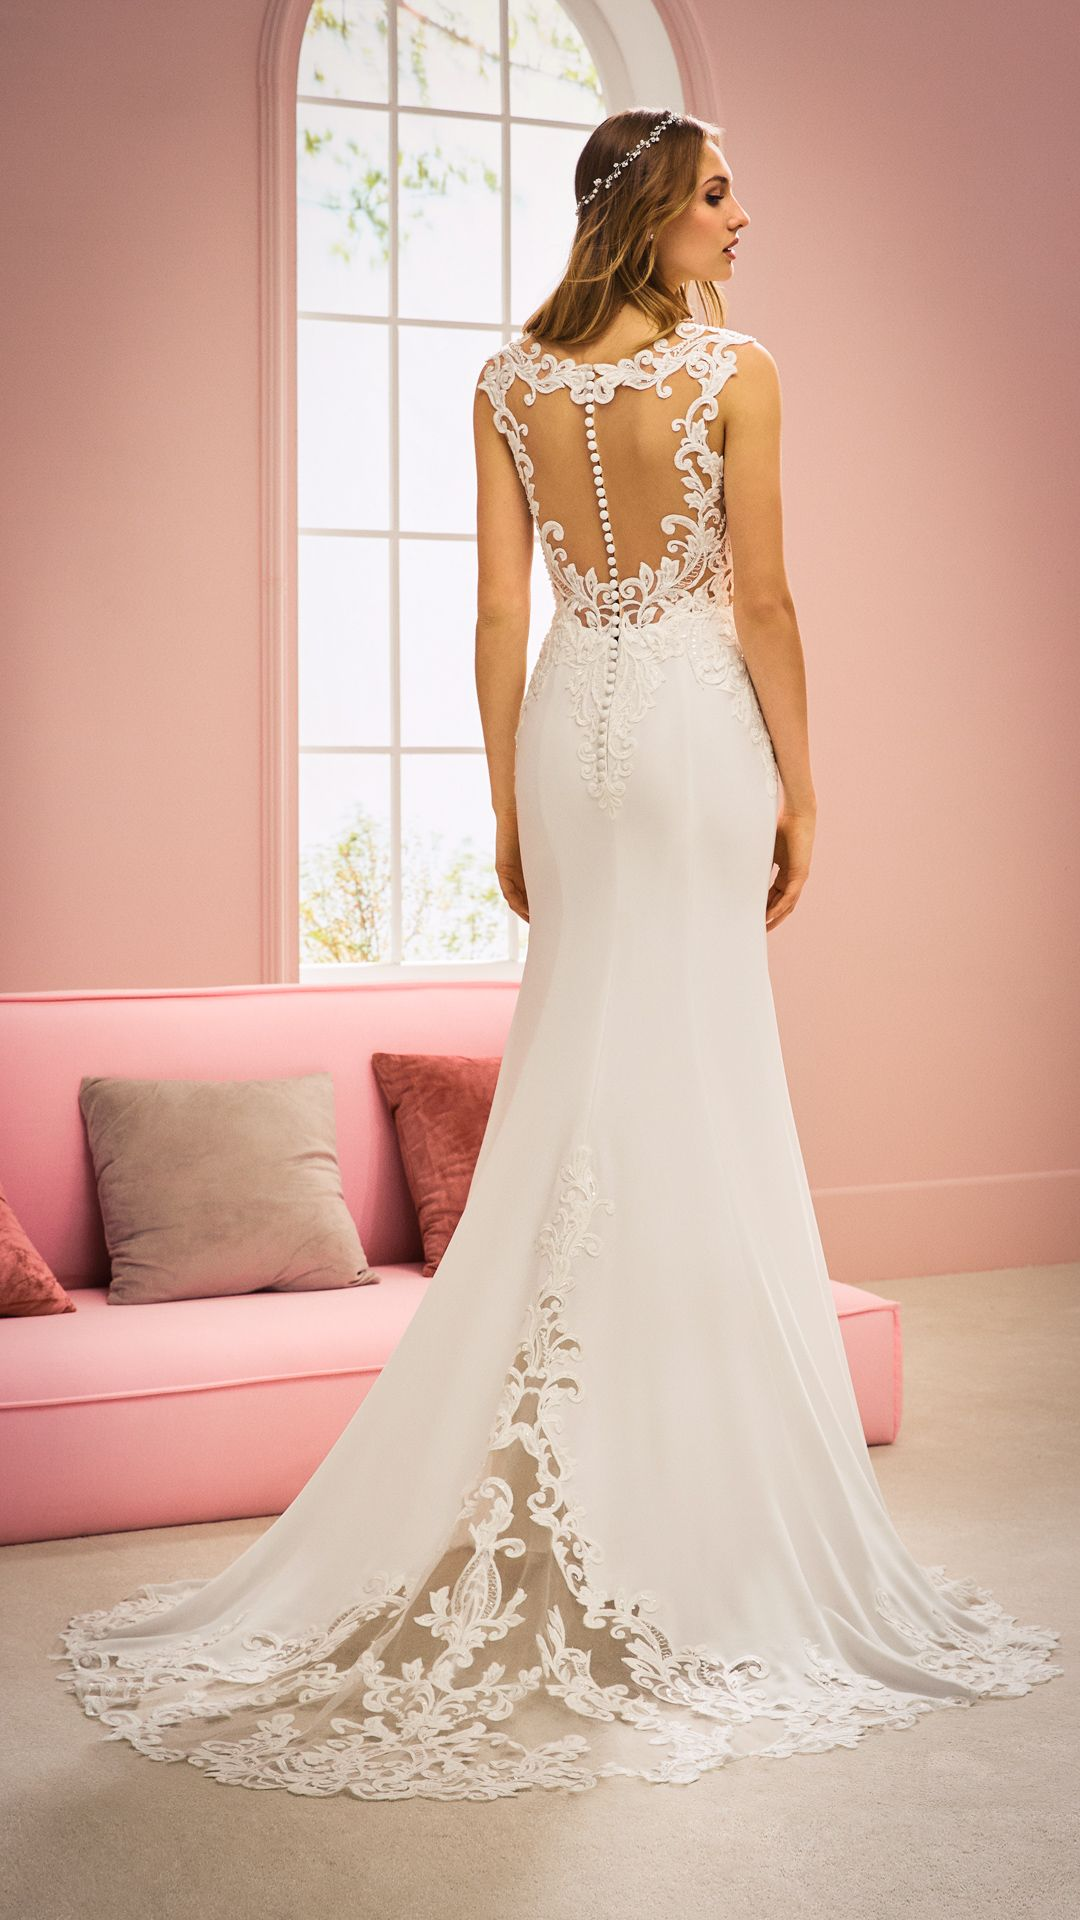 Hochzeitskleider 20 White One Kollektion Modell: LAVA-C